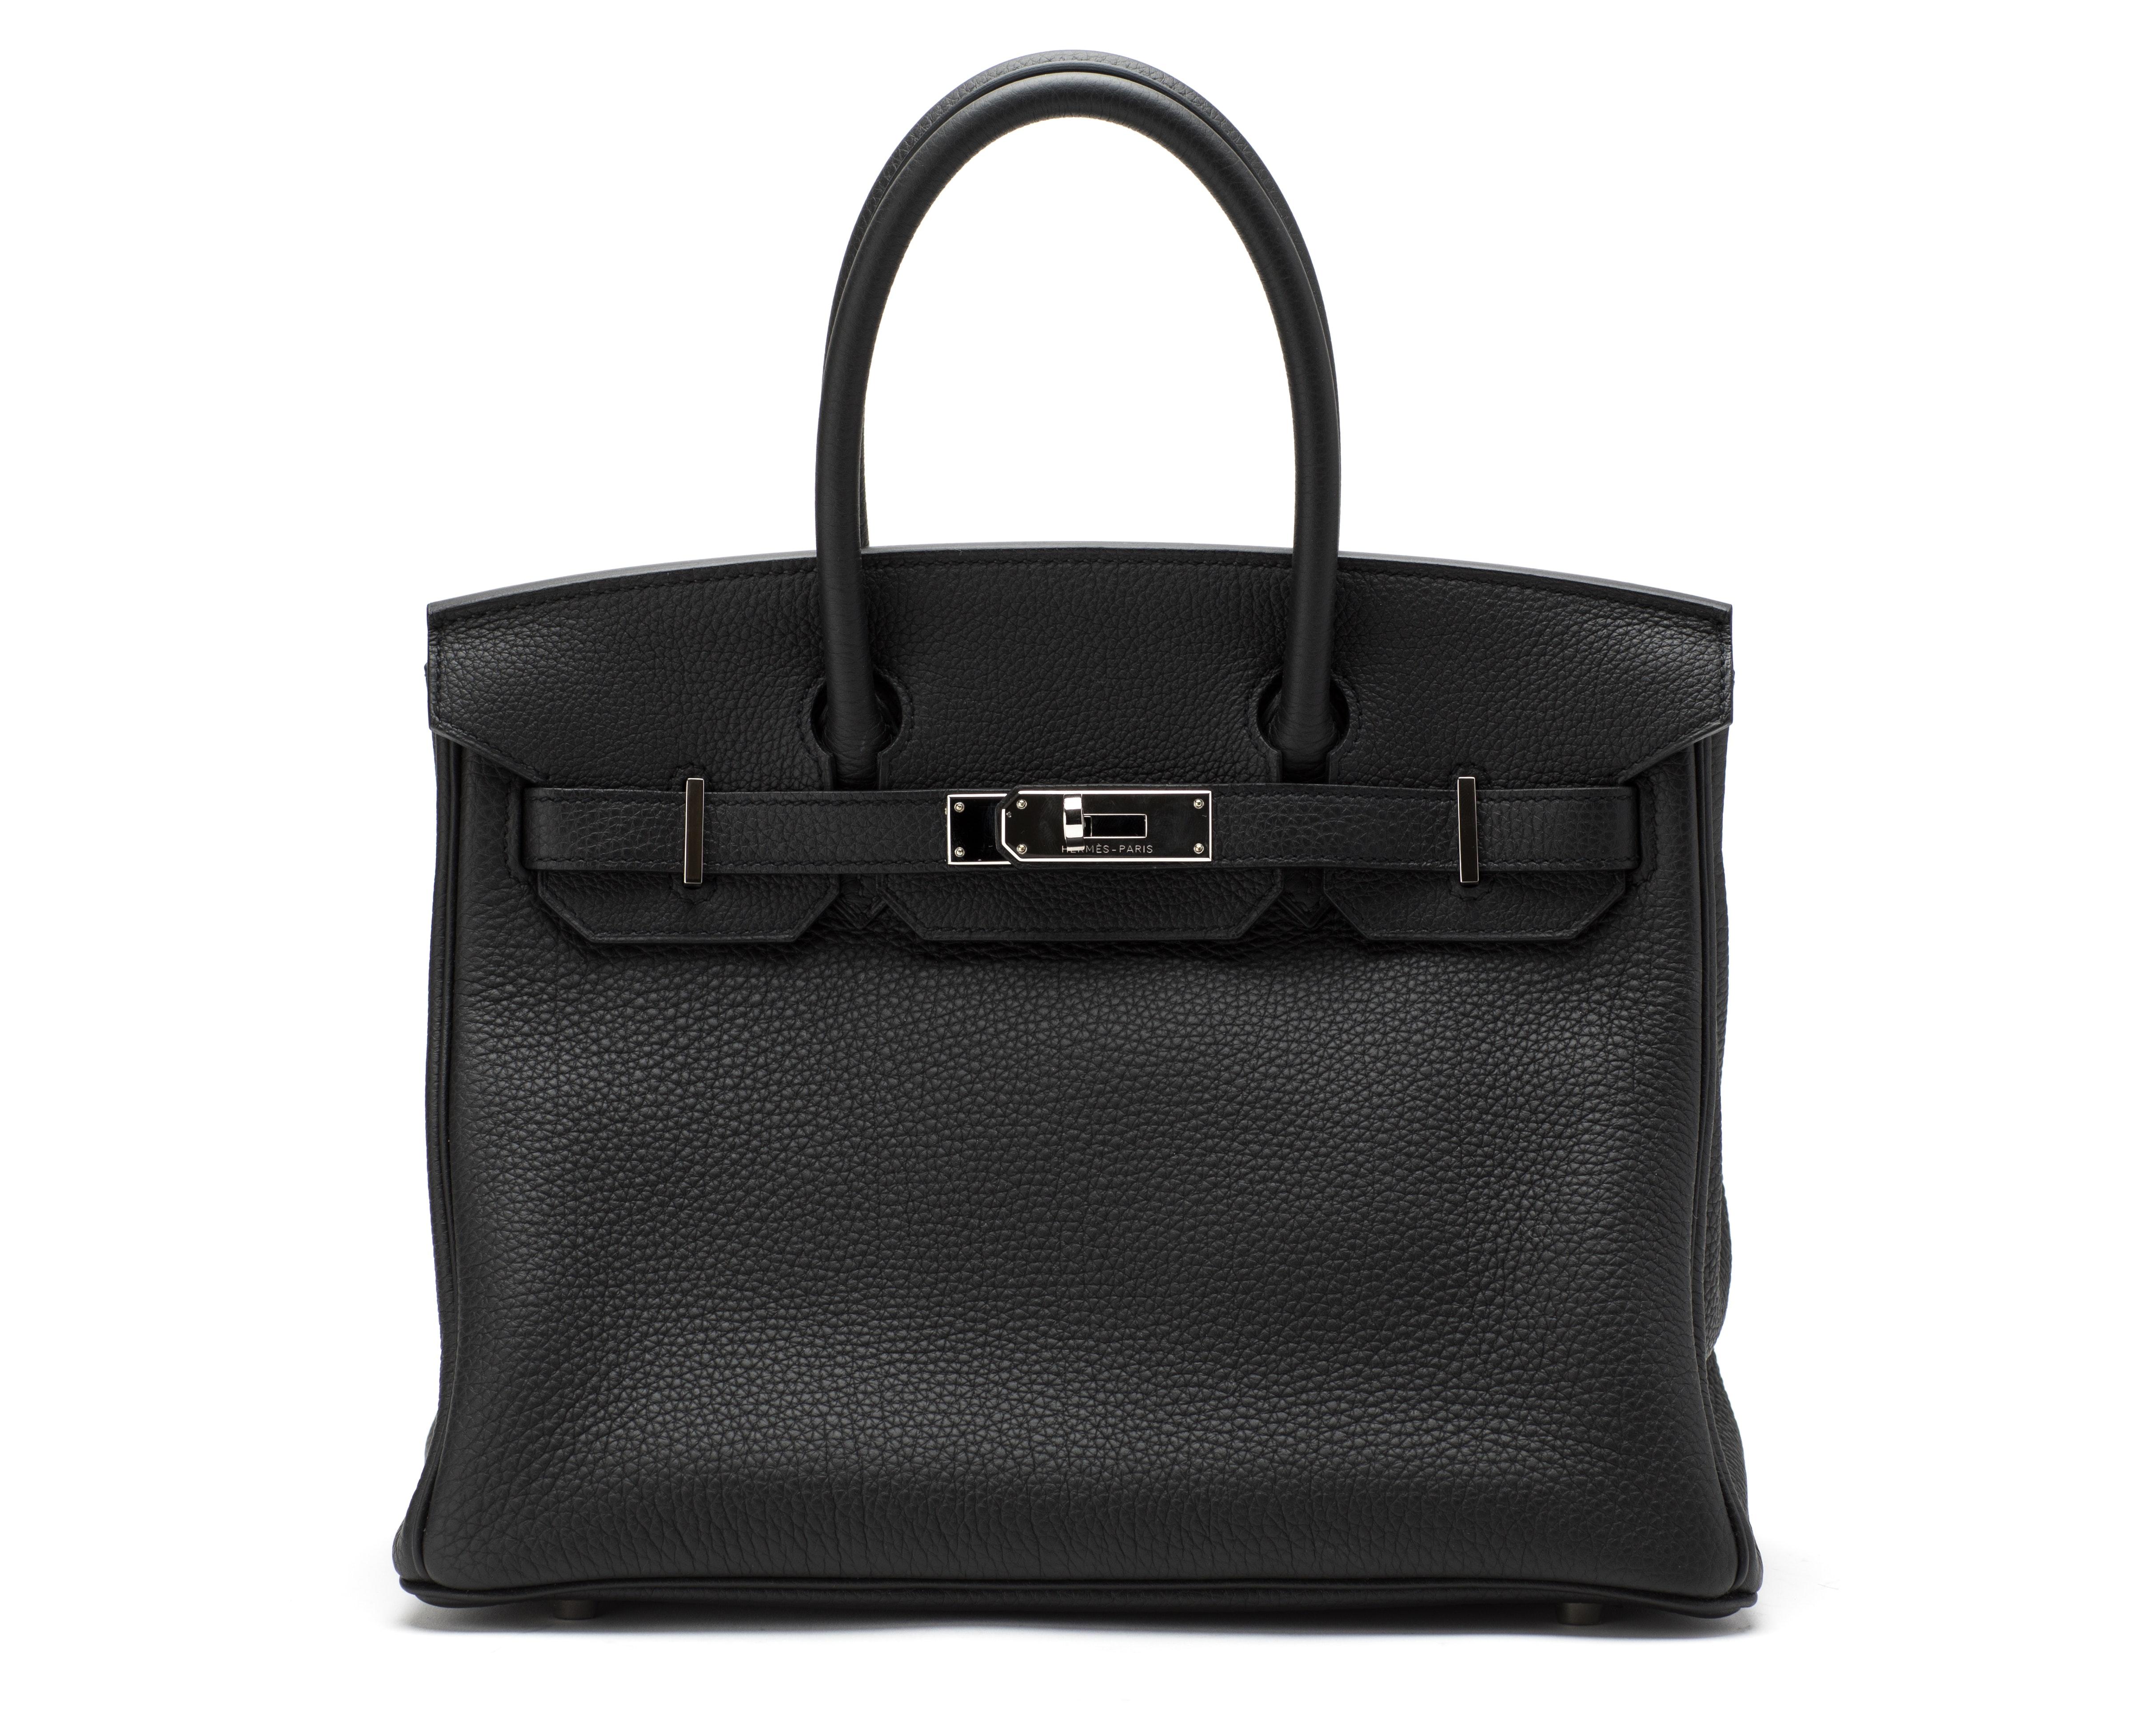 Hermes Birkin Togo 30 Noir